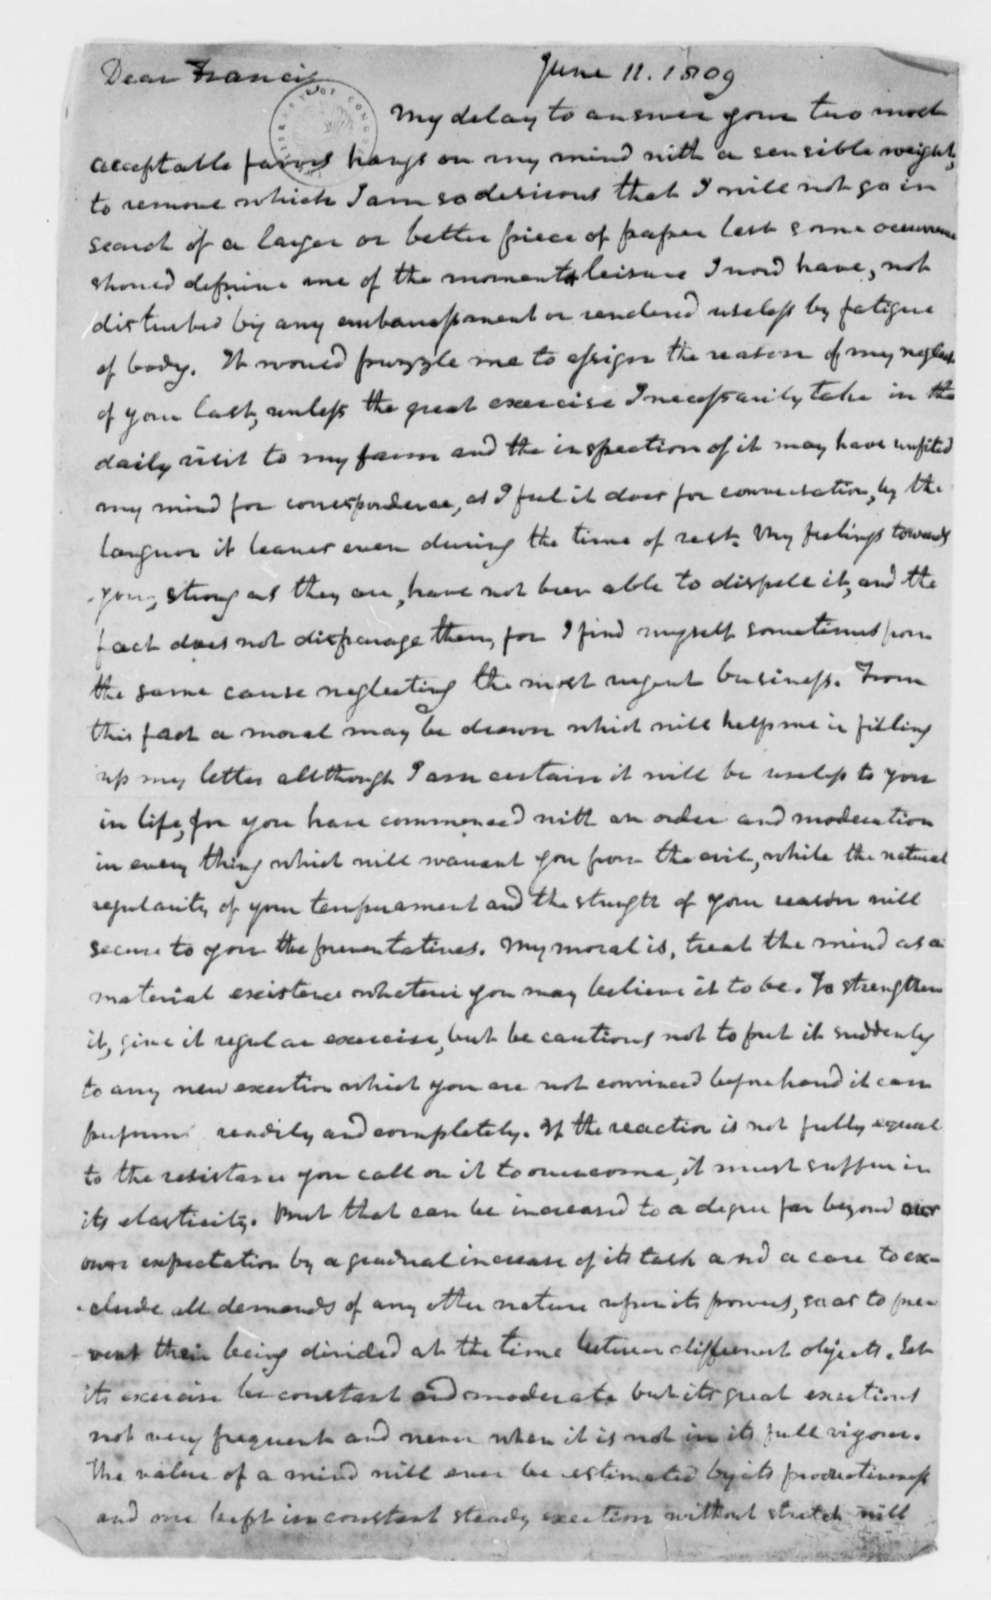 Thomas Mann Randolph, Jr. to Francis W. Gilmer, June 11, 1809